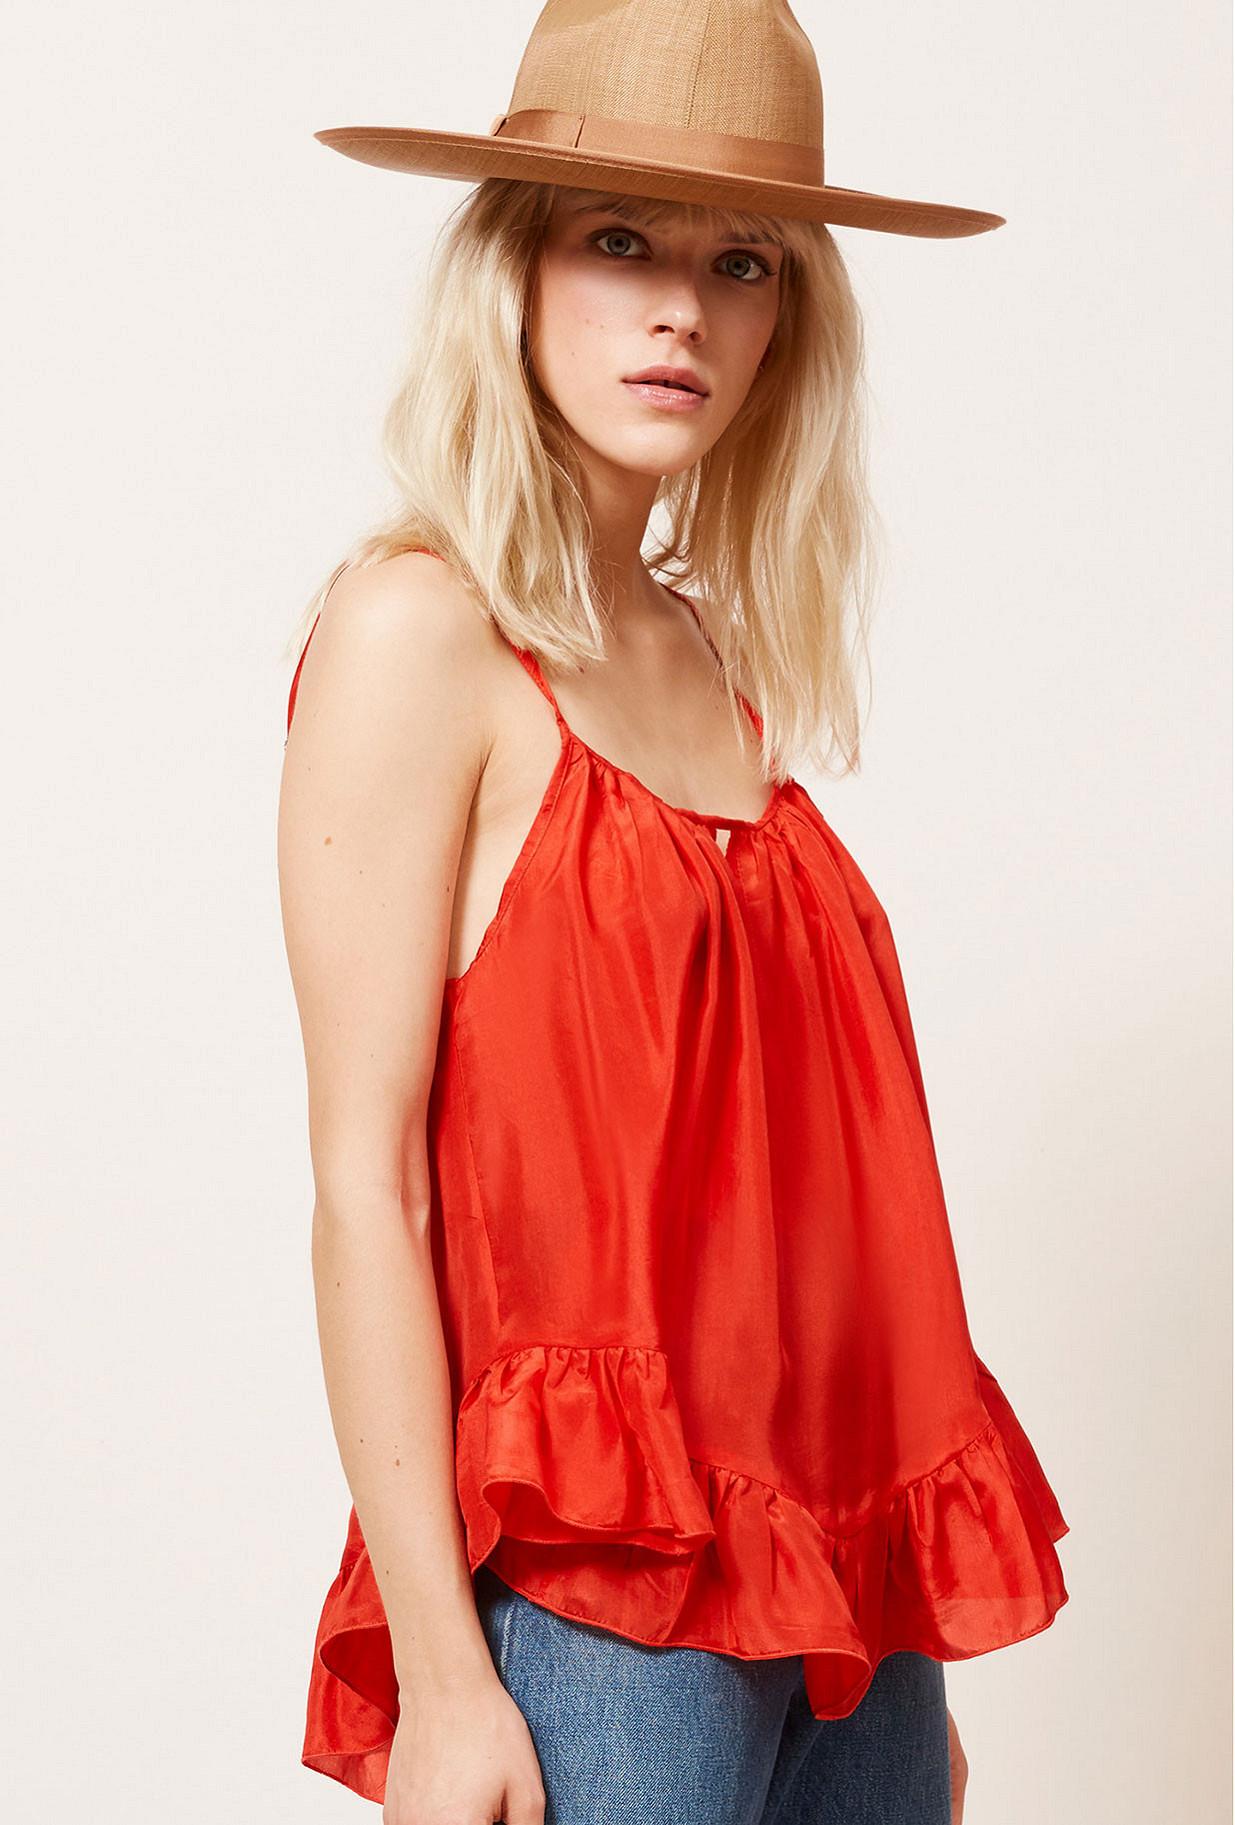 women clothes Top  Narna